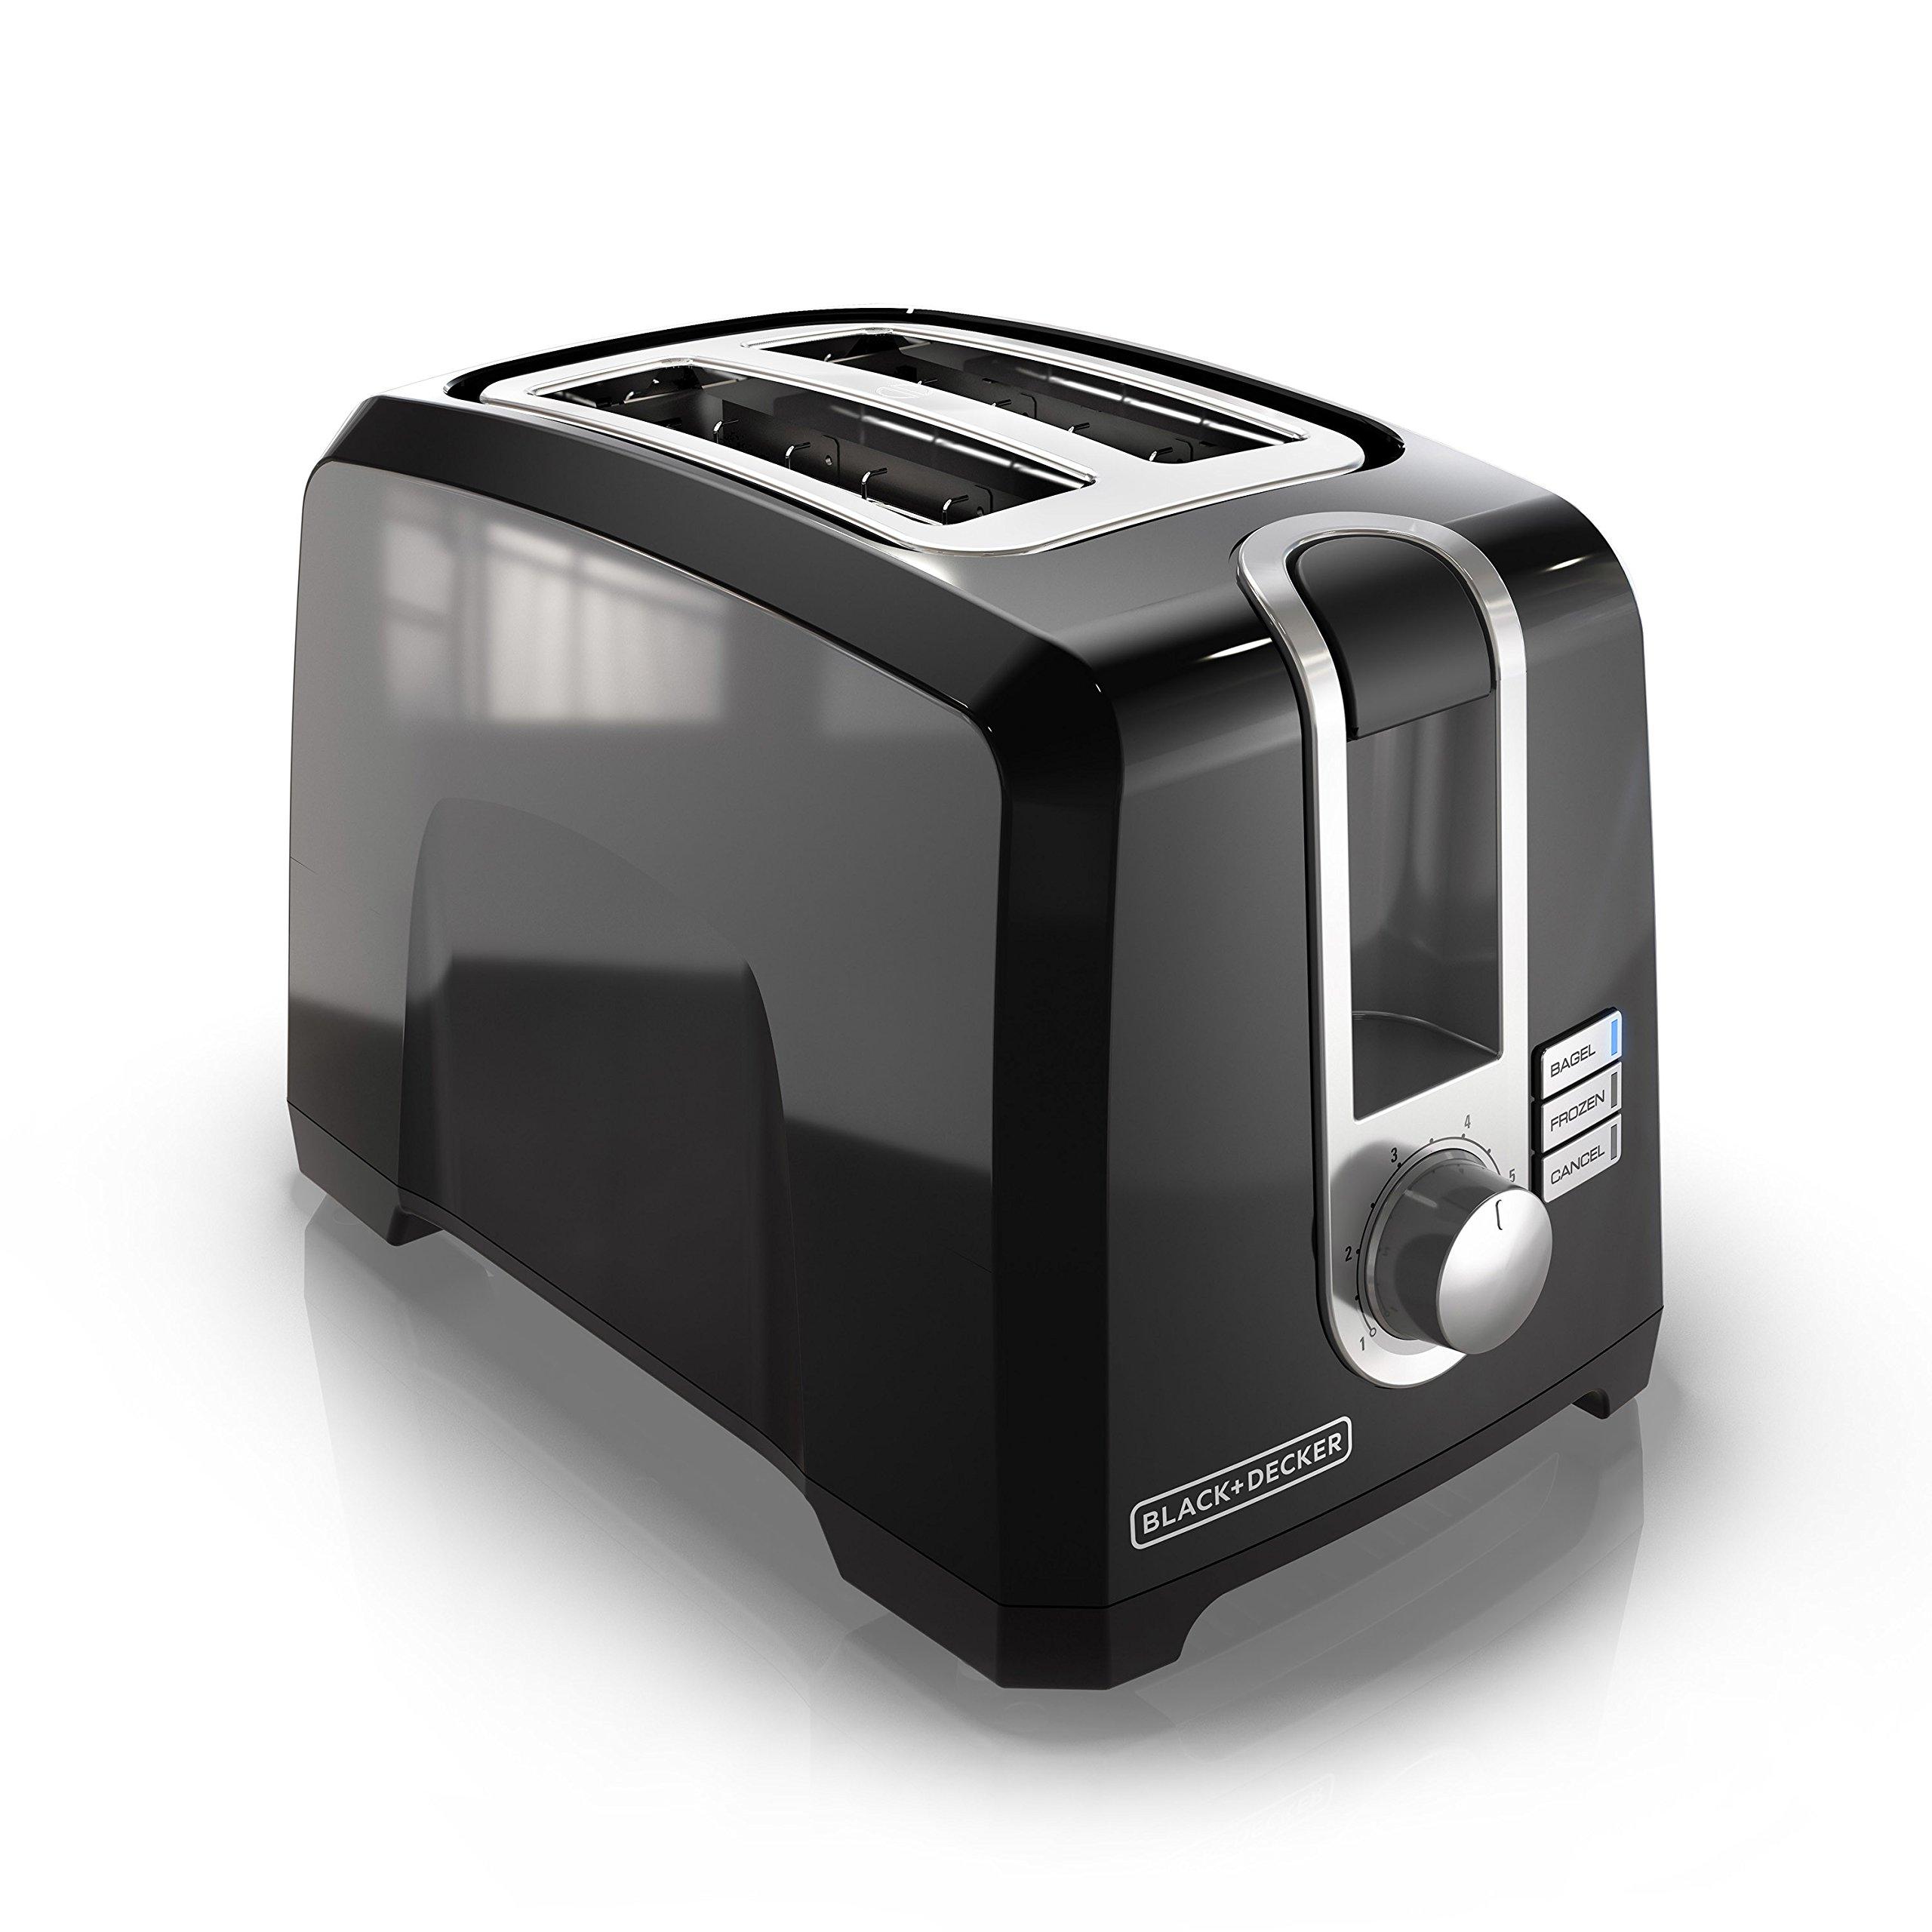 evoke richards black slice morphy toaster